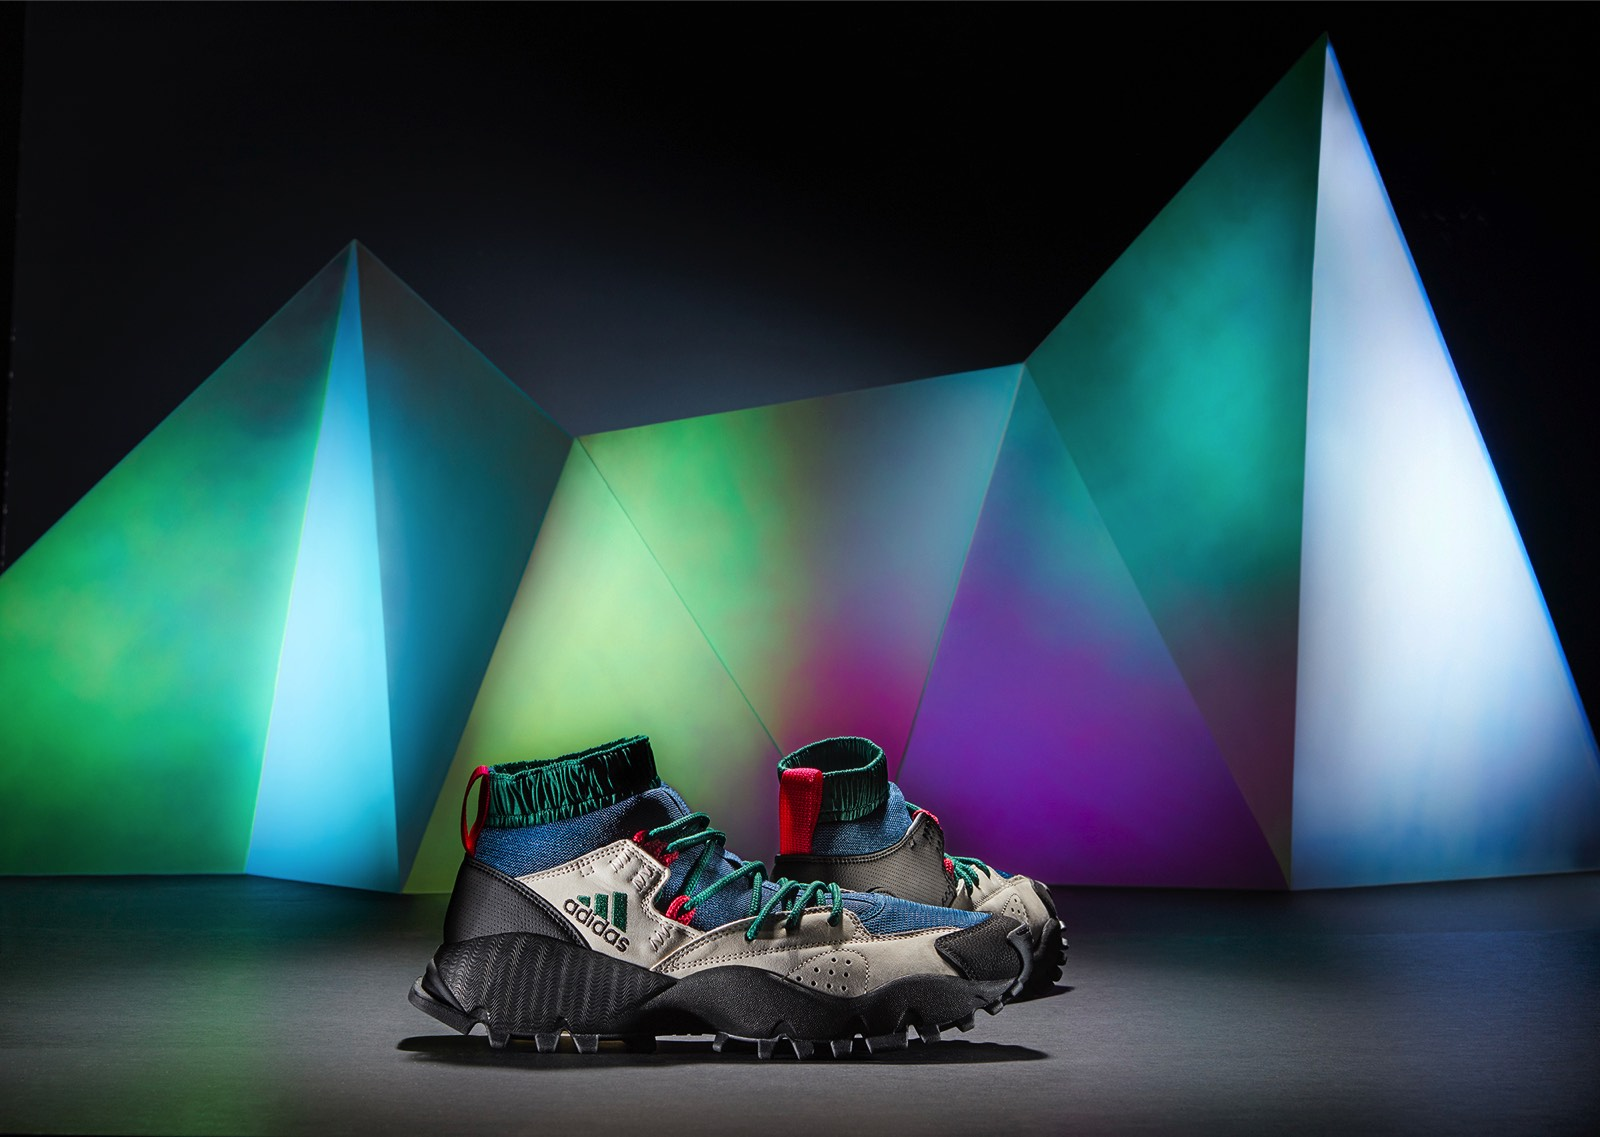 h20515_or_originals_footwear_packs_fw16_seeyoulater_s80017_01